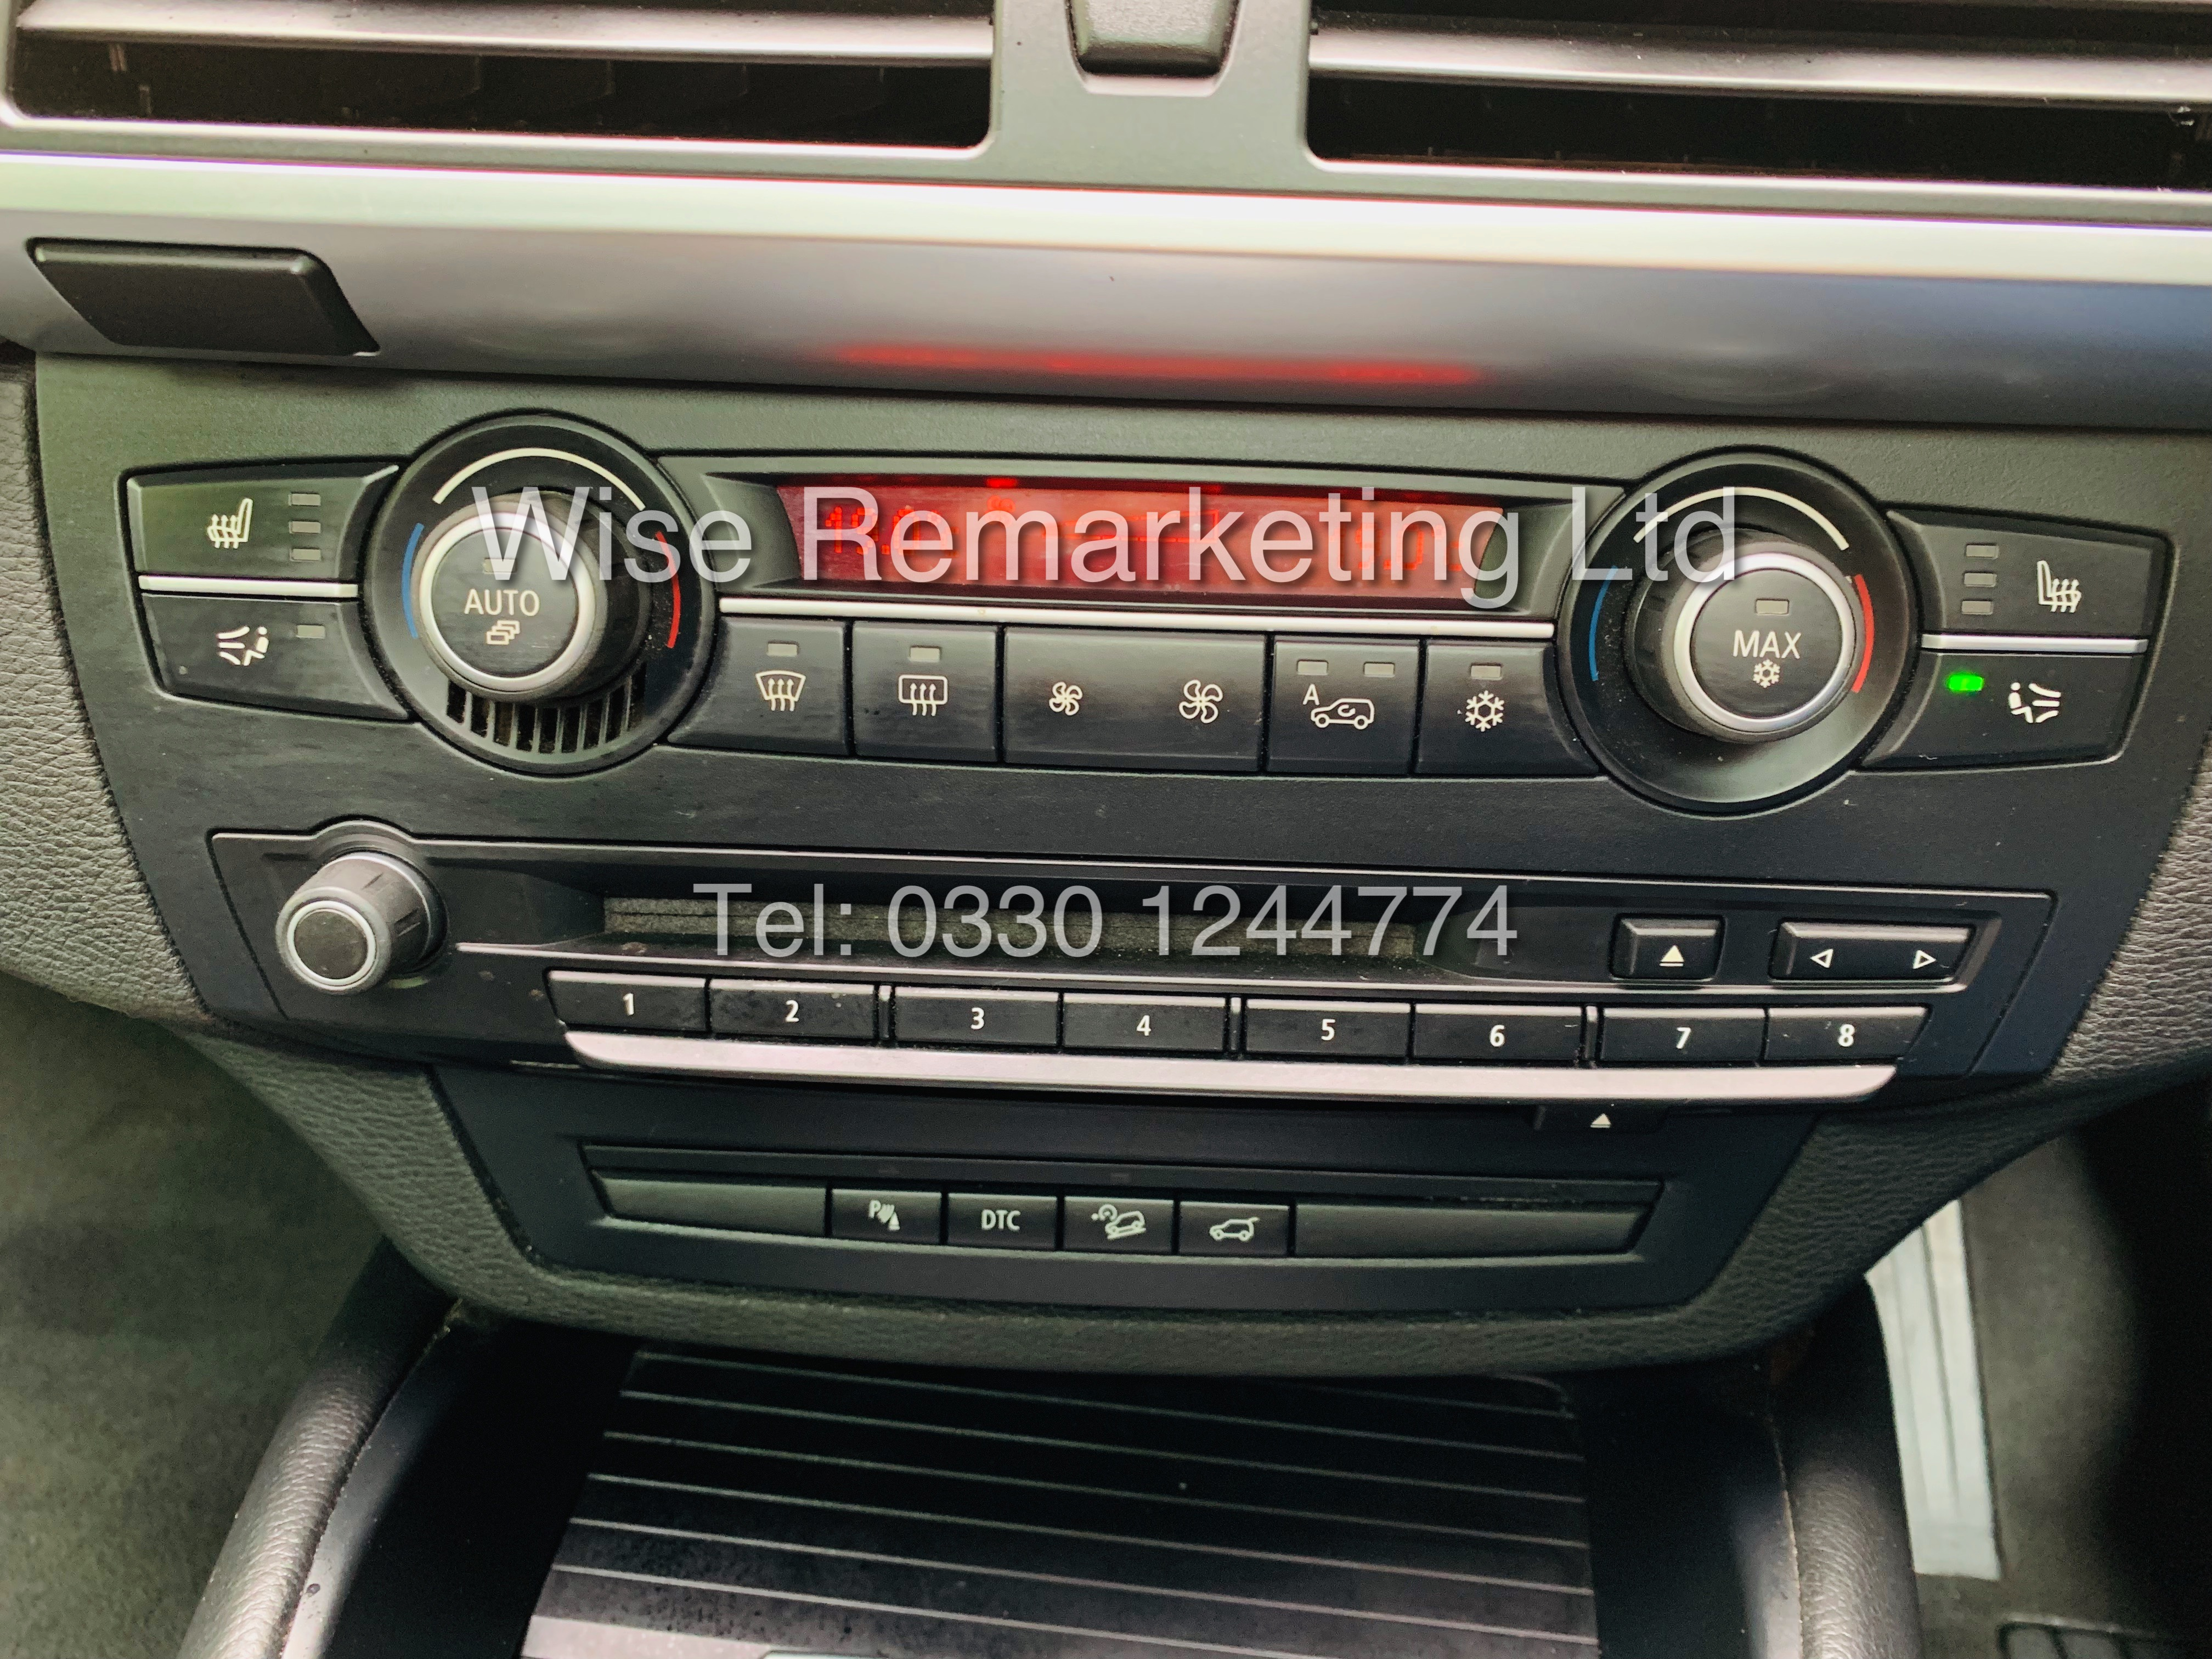 BMW X6 XDRIVE 35D AUTO (2009 SPEC) *1 PREVIOUS OWNER* PARKING AID - SAT NAV - FSH - Image 24 of 25